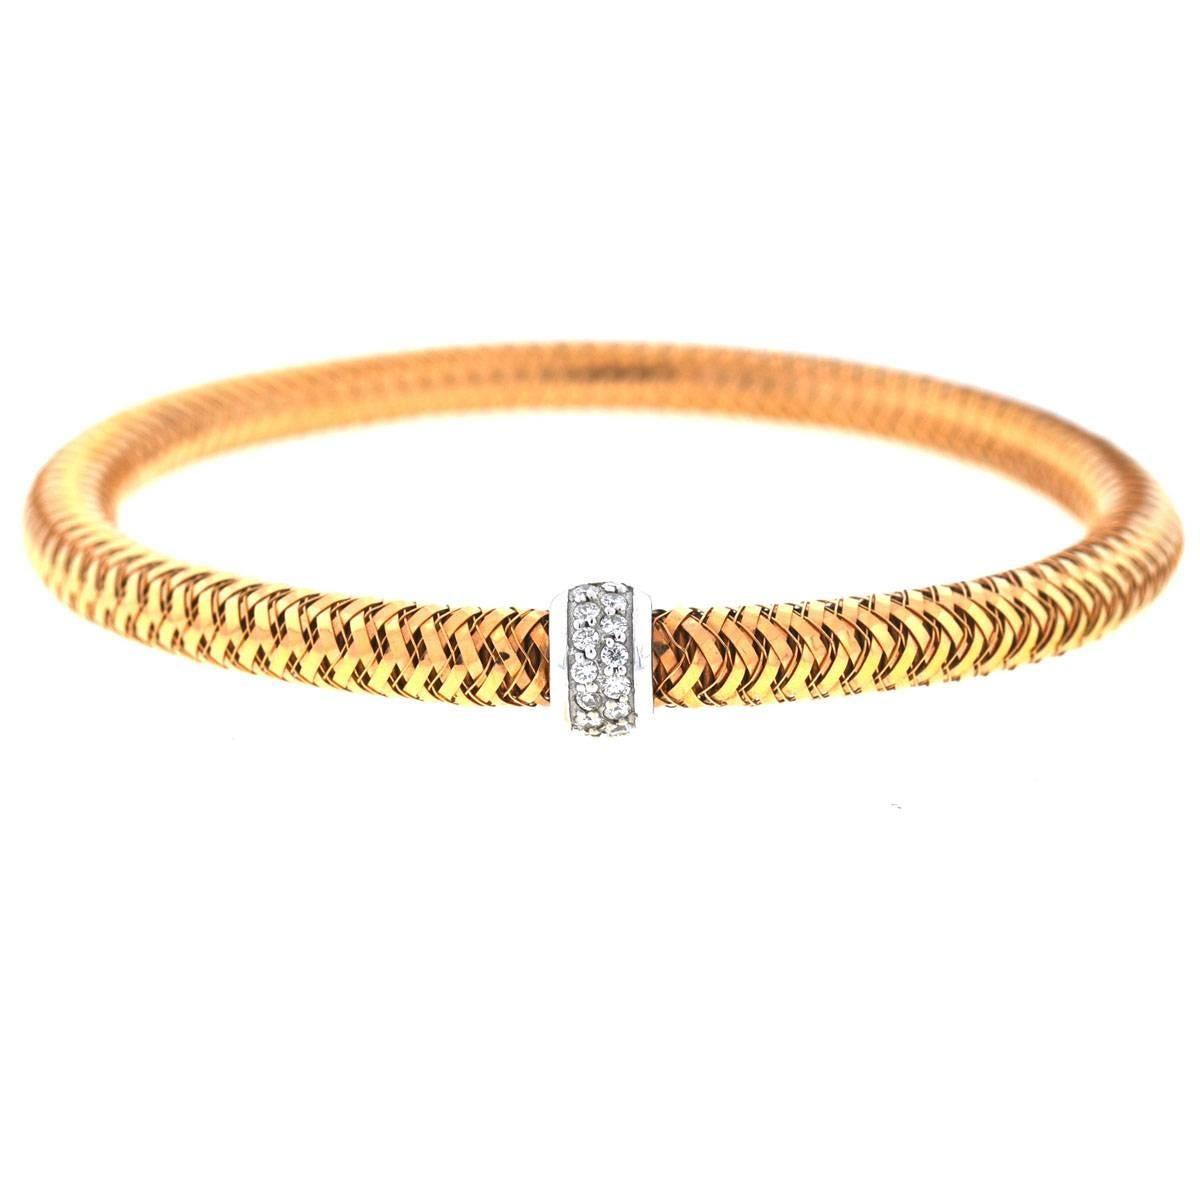 Roberto Coin 18 Karat Rose Gold Primavera Bracelet